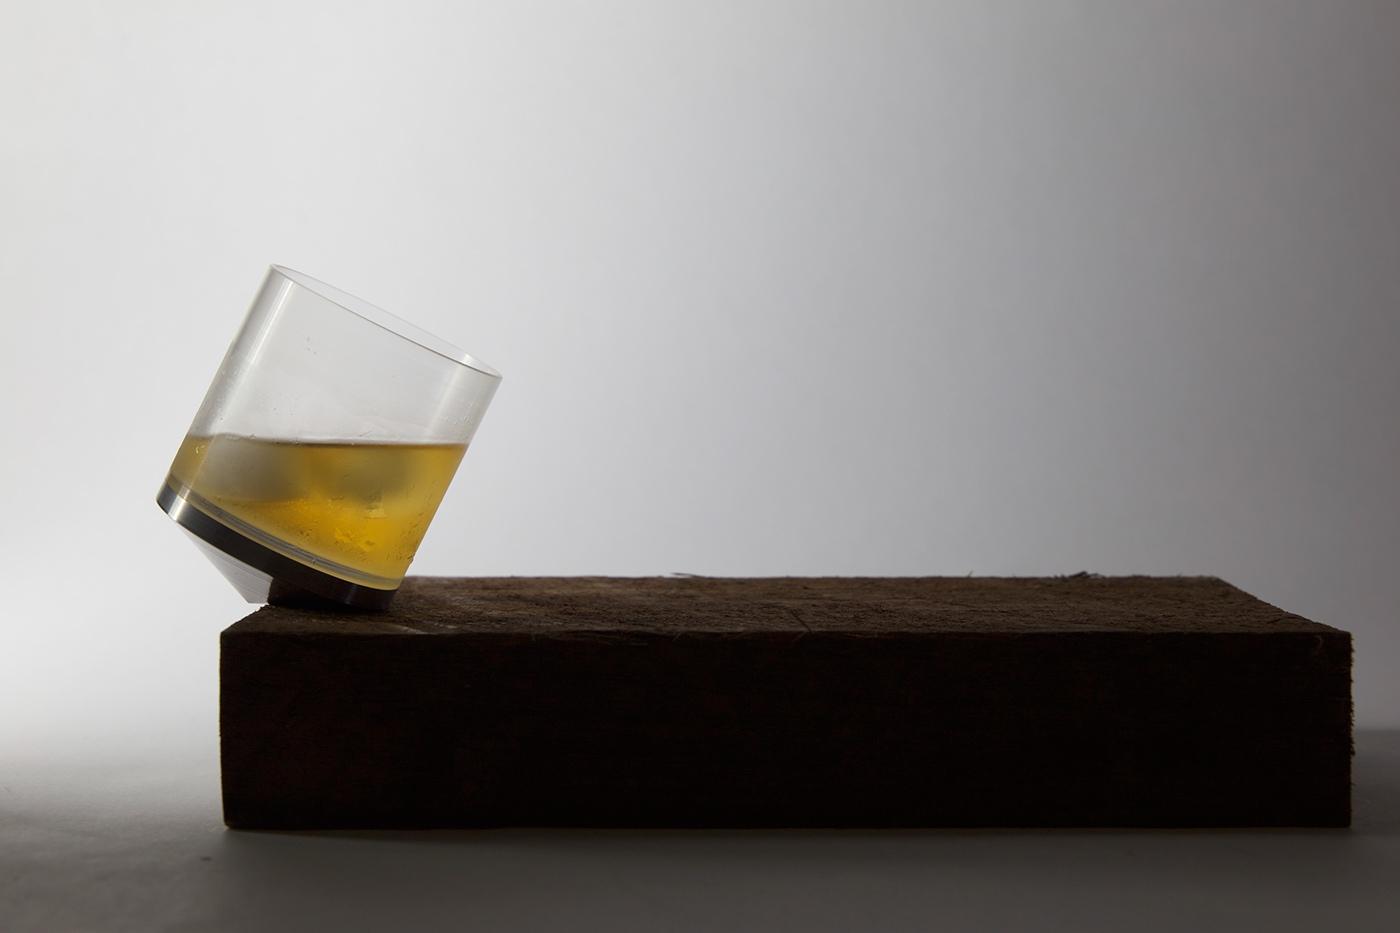 Tipsy rocking whisky glass by Pezanne Khambatta